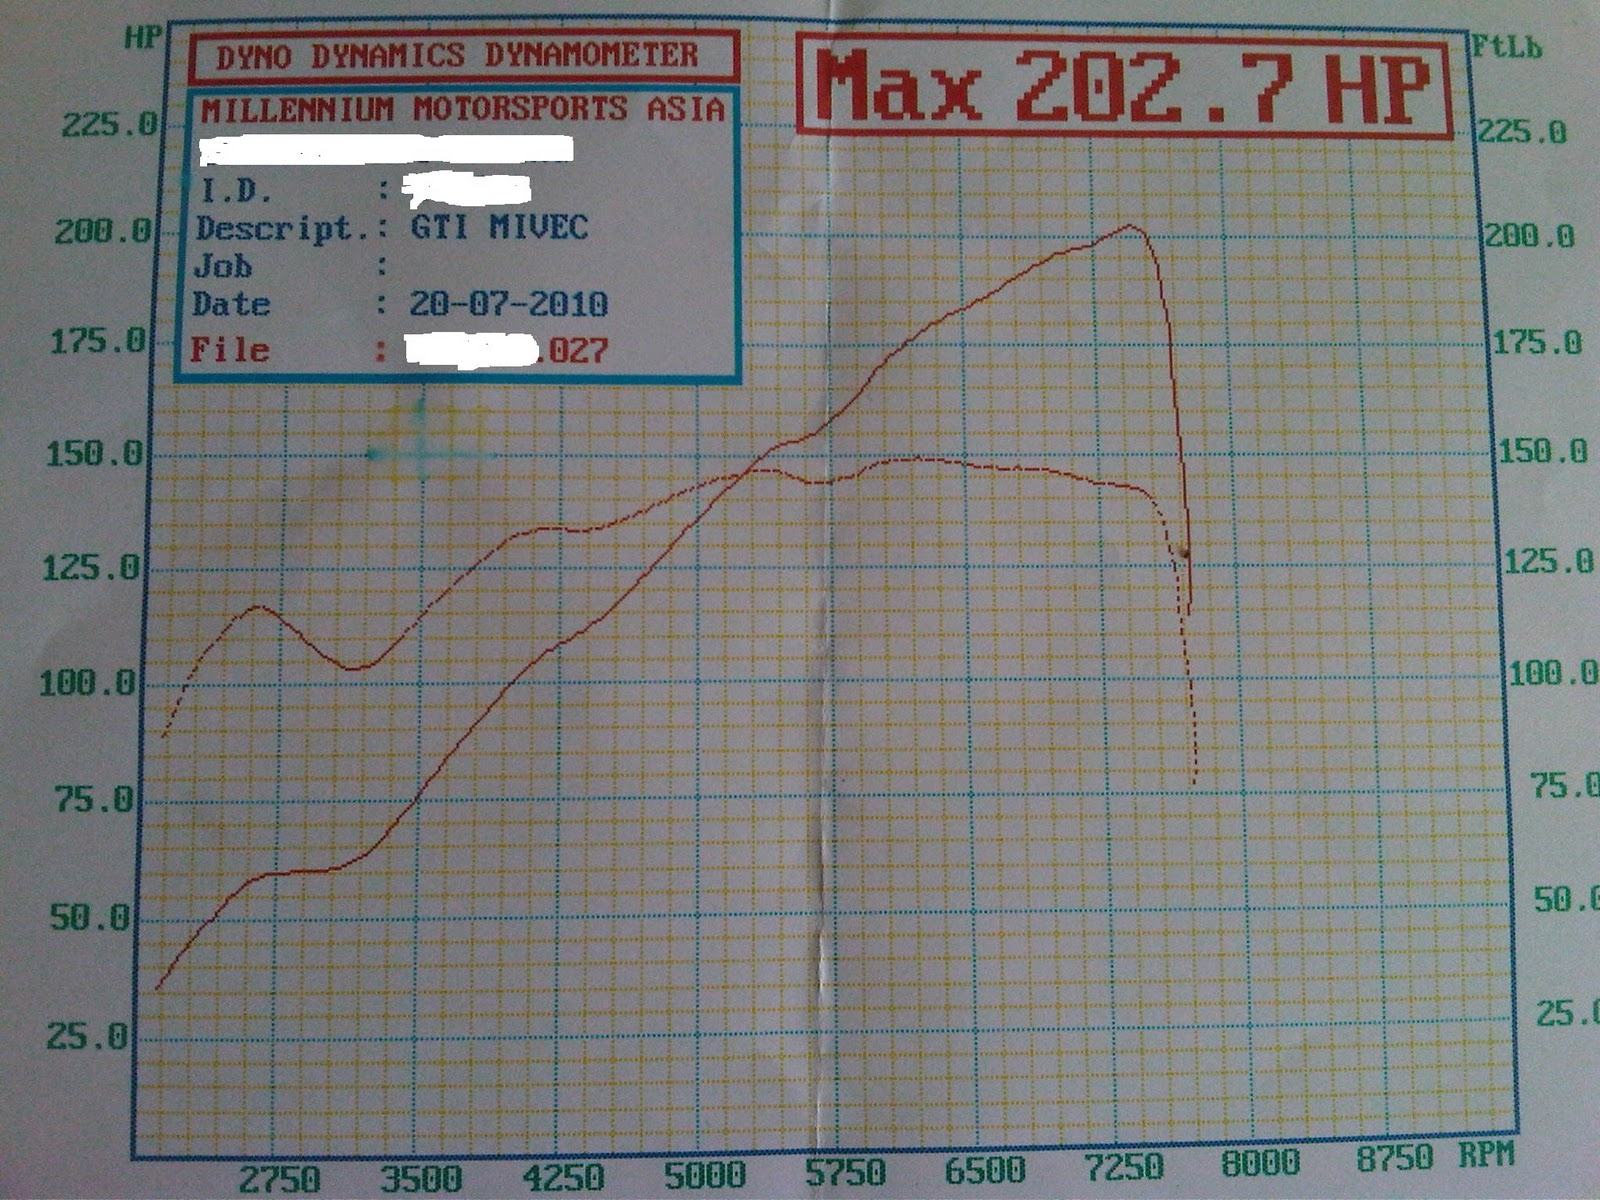 stroker engine diagram 3 1 [ 1600 x 1200 Pixel ]